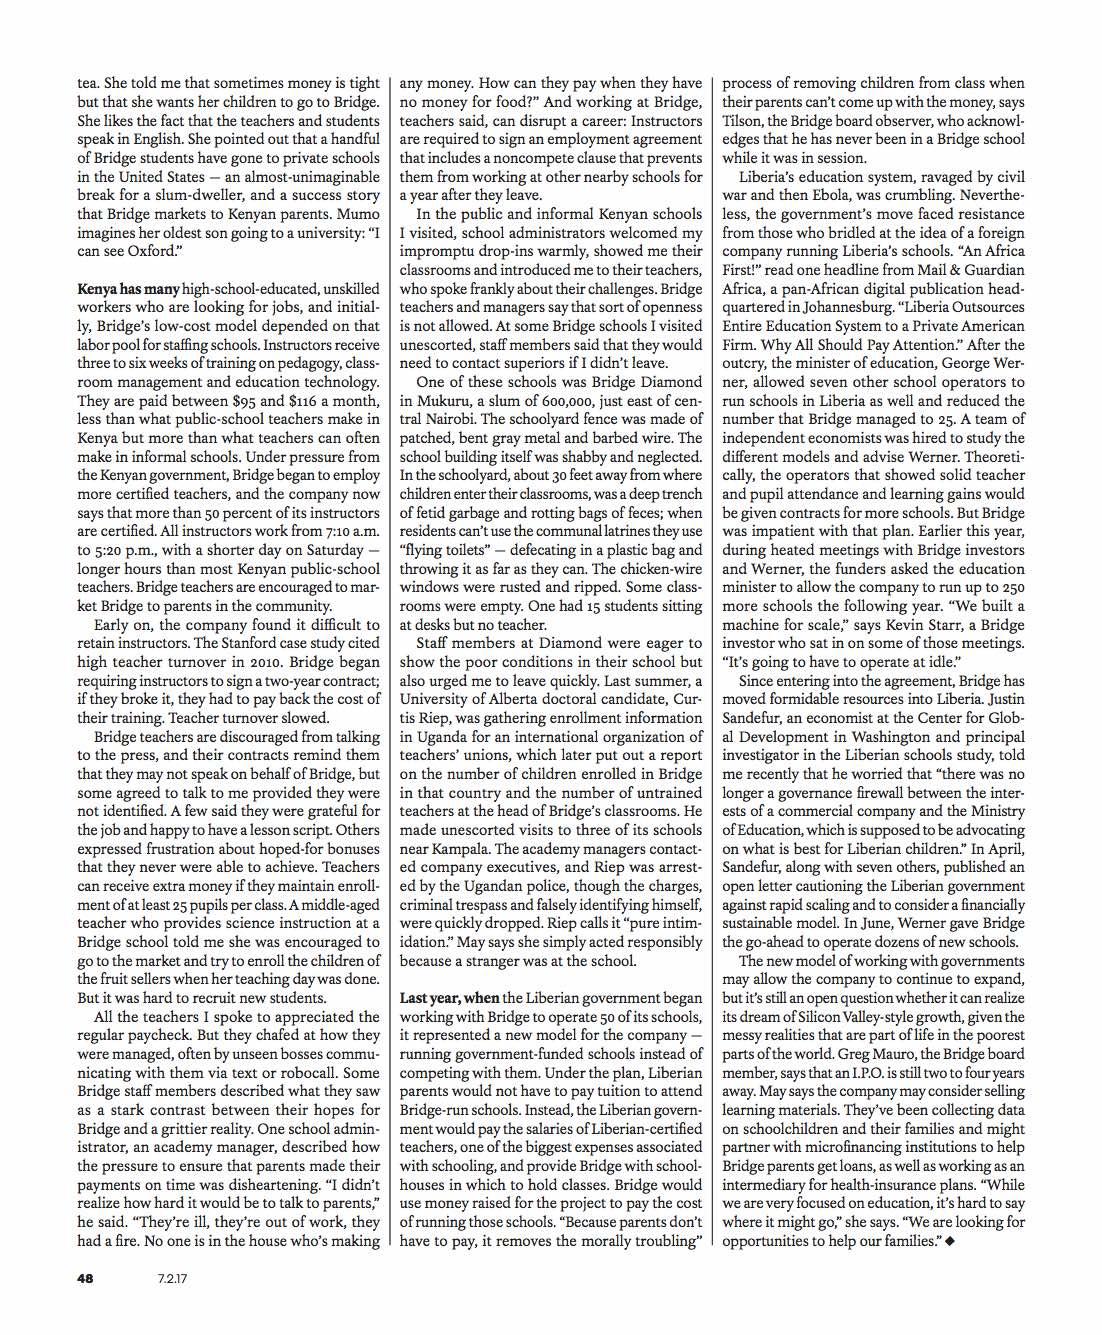 Diana Zeyneb Alhindawi_2017_07_02_New York Times Magazine_page 48_bridge education africa s.jpg